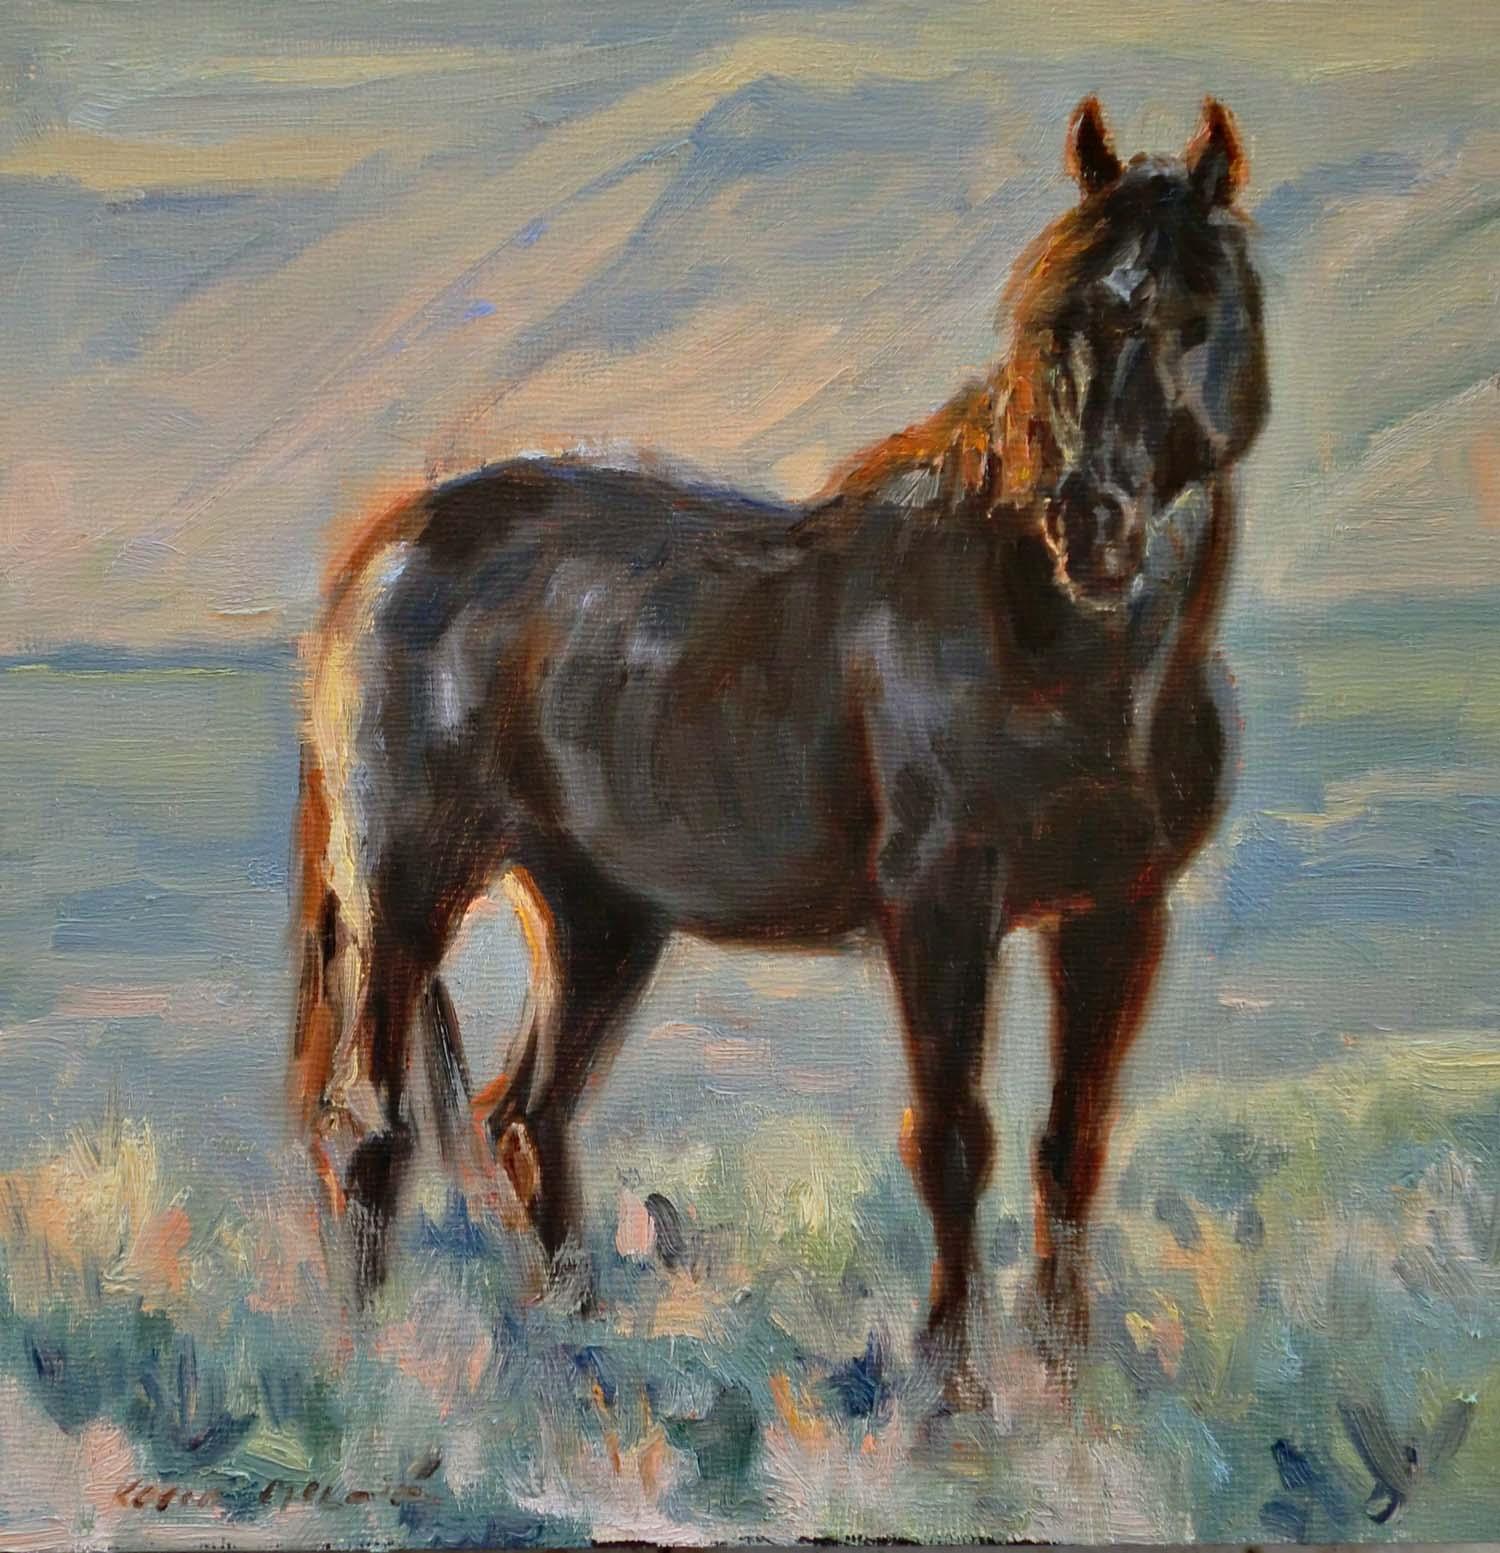 Karen McLain Studio: Wild Horses-Wild Lands Exhibit